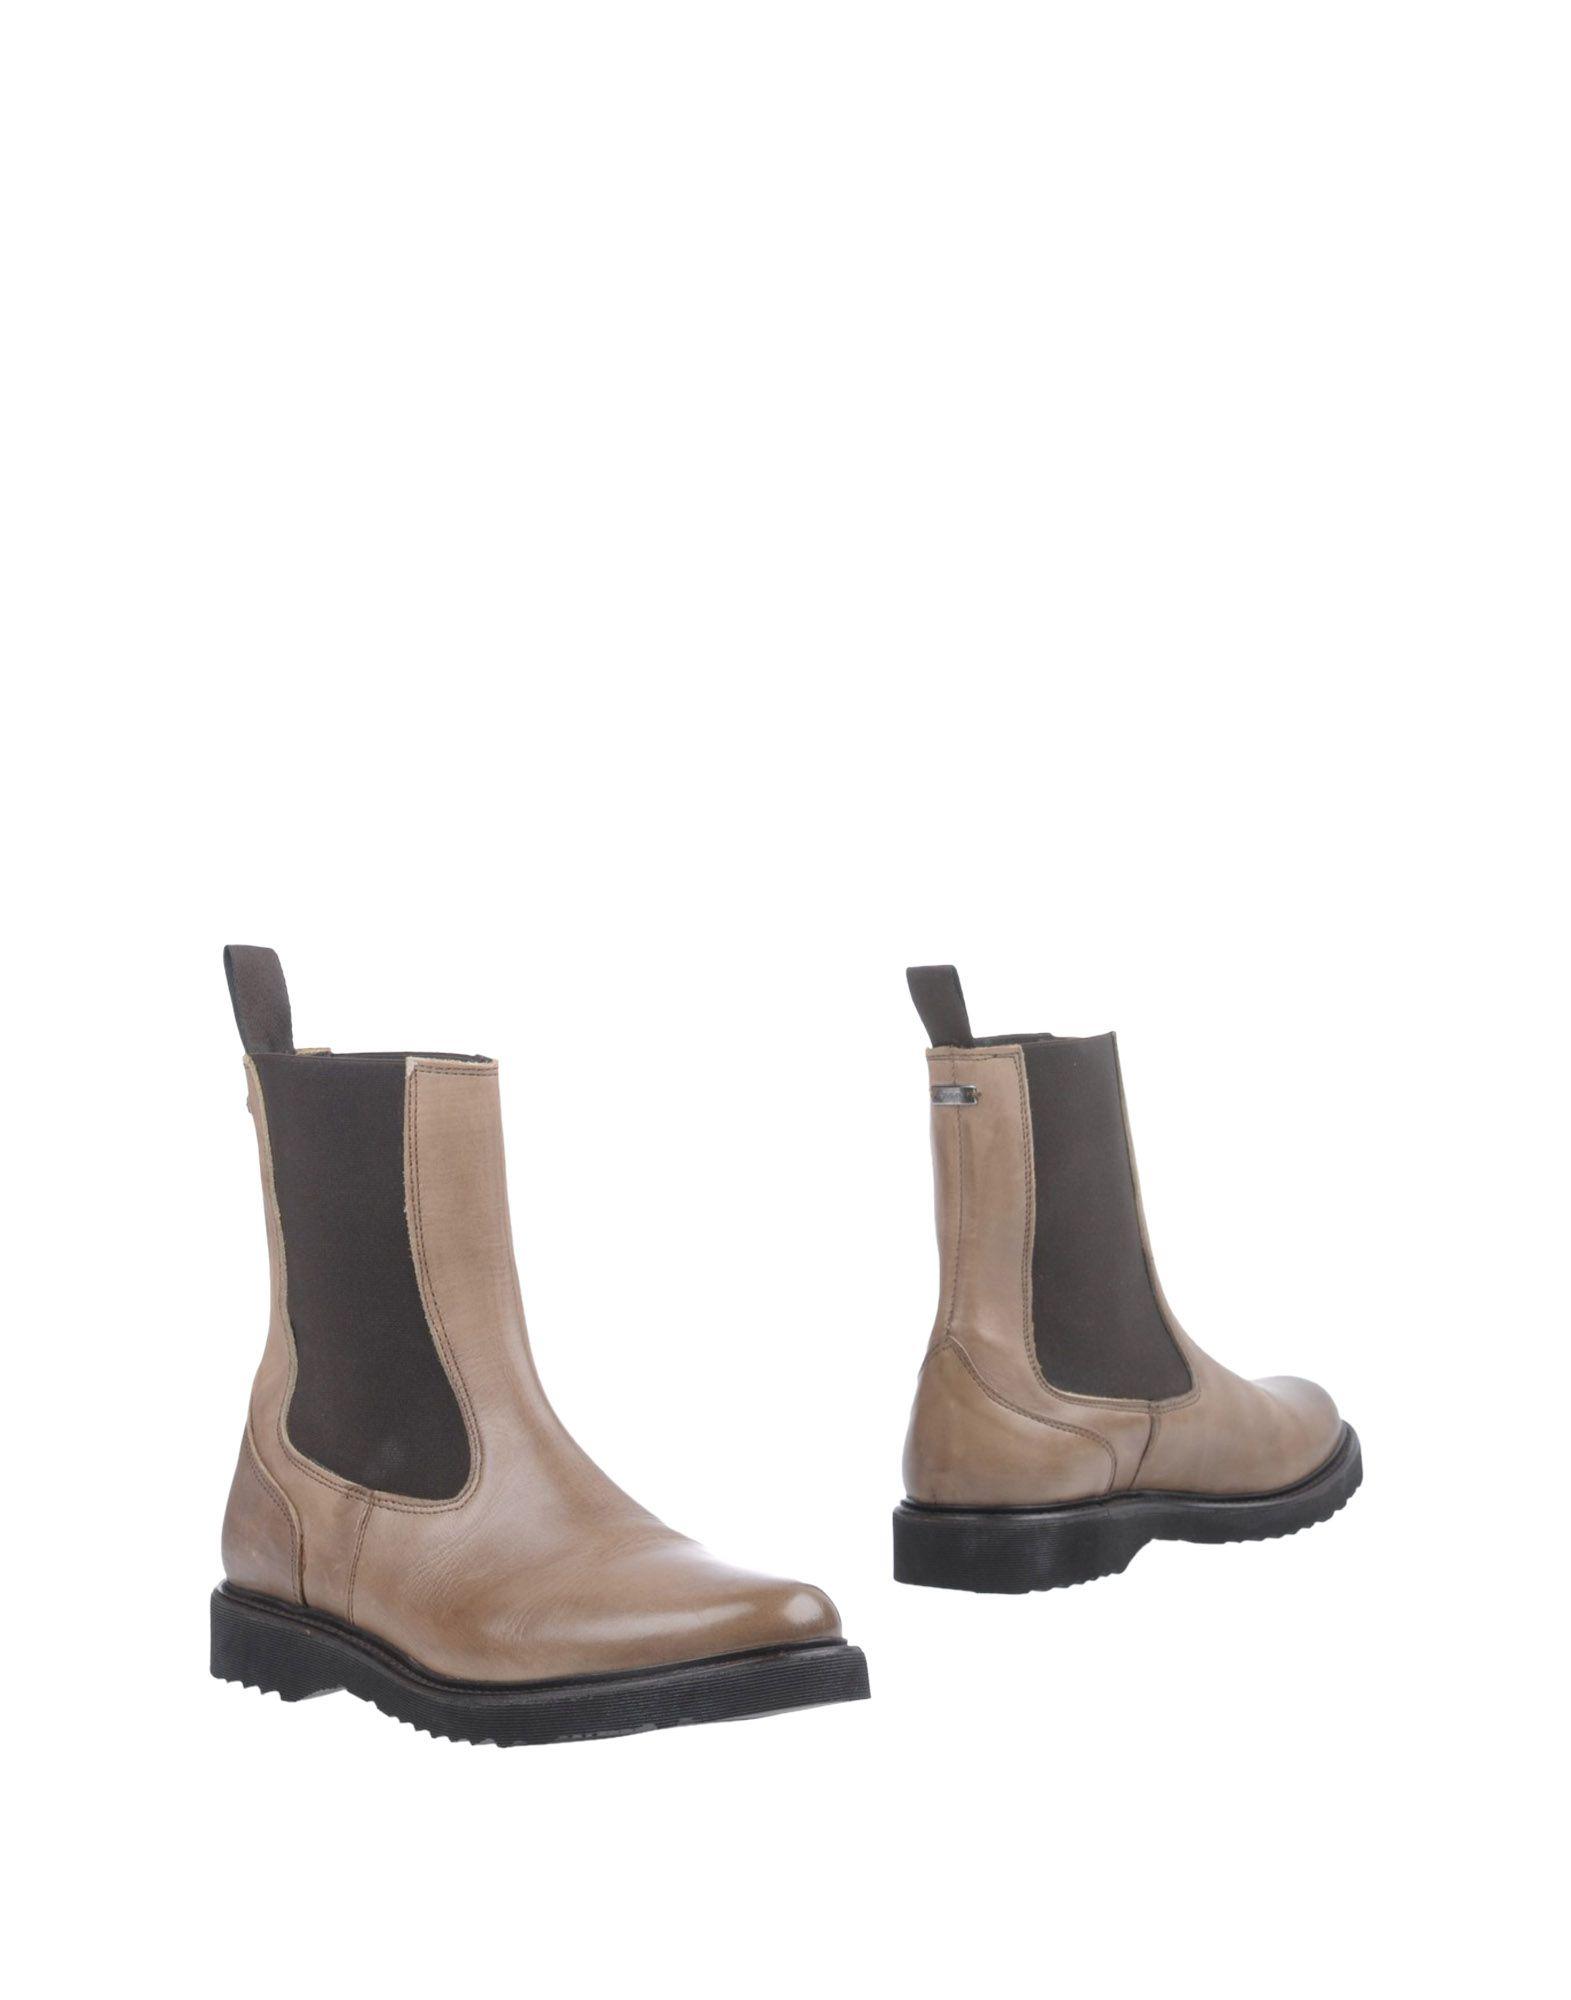 SEVENTY Полусапоги и высокие ботинки magazzini del sale полусапоги и высокие ботинки